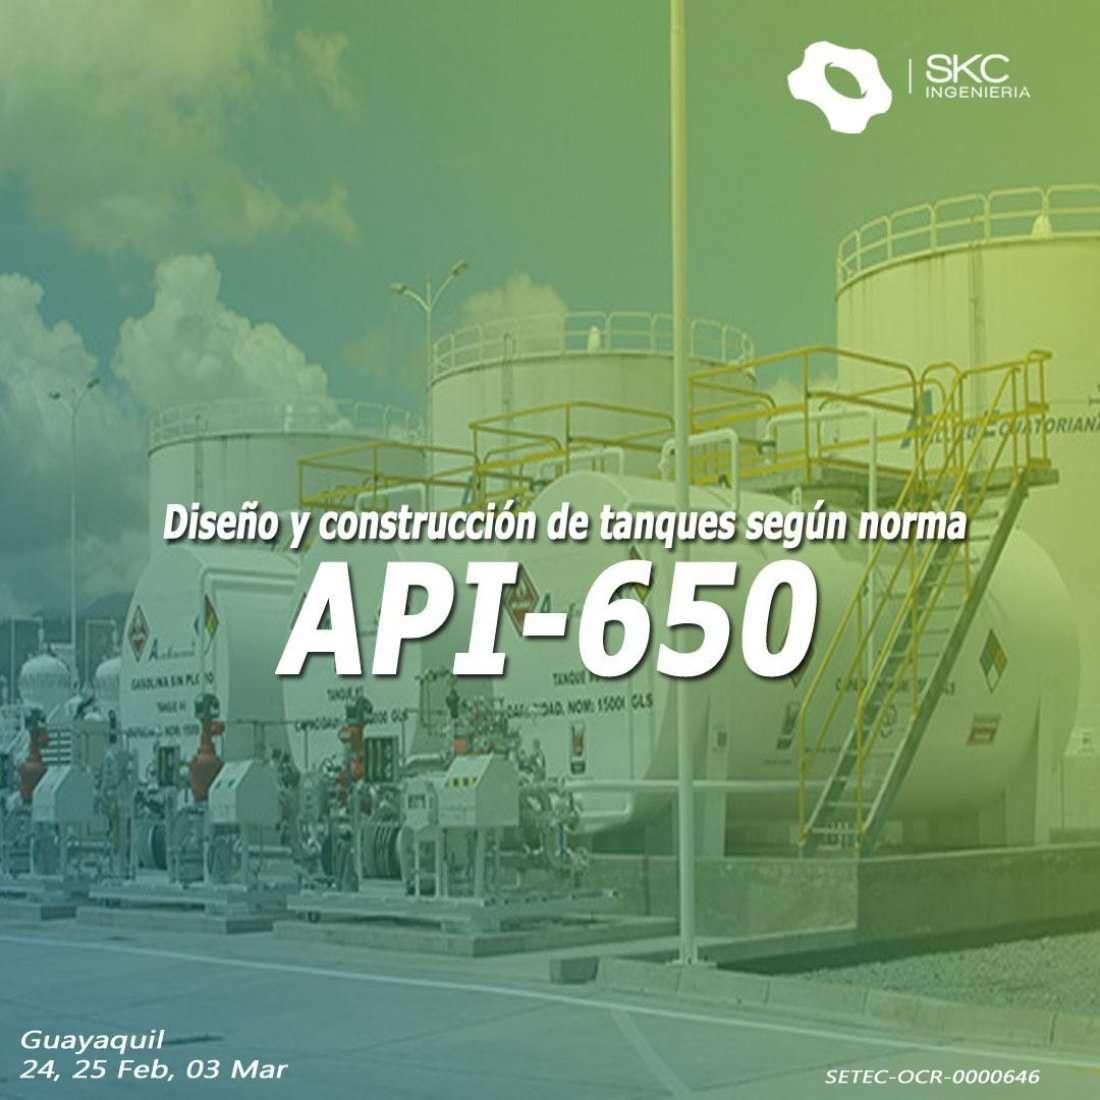 Diseo y Construccin de Tanques Atmosfricos segn API650 at Urdesa Central Guayaquil